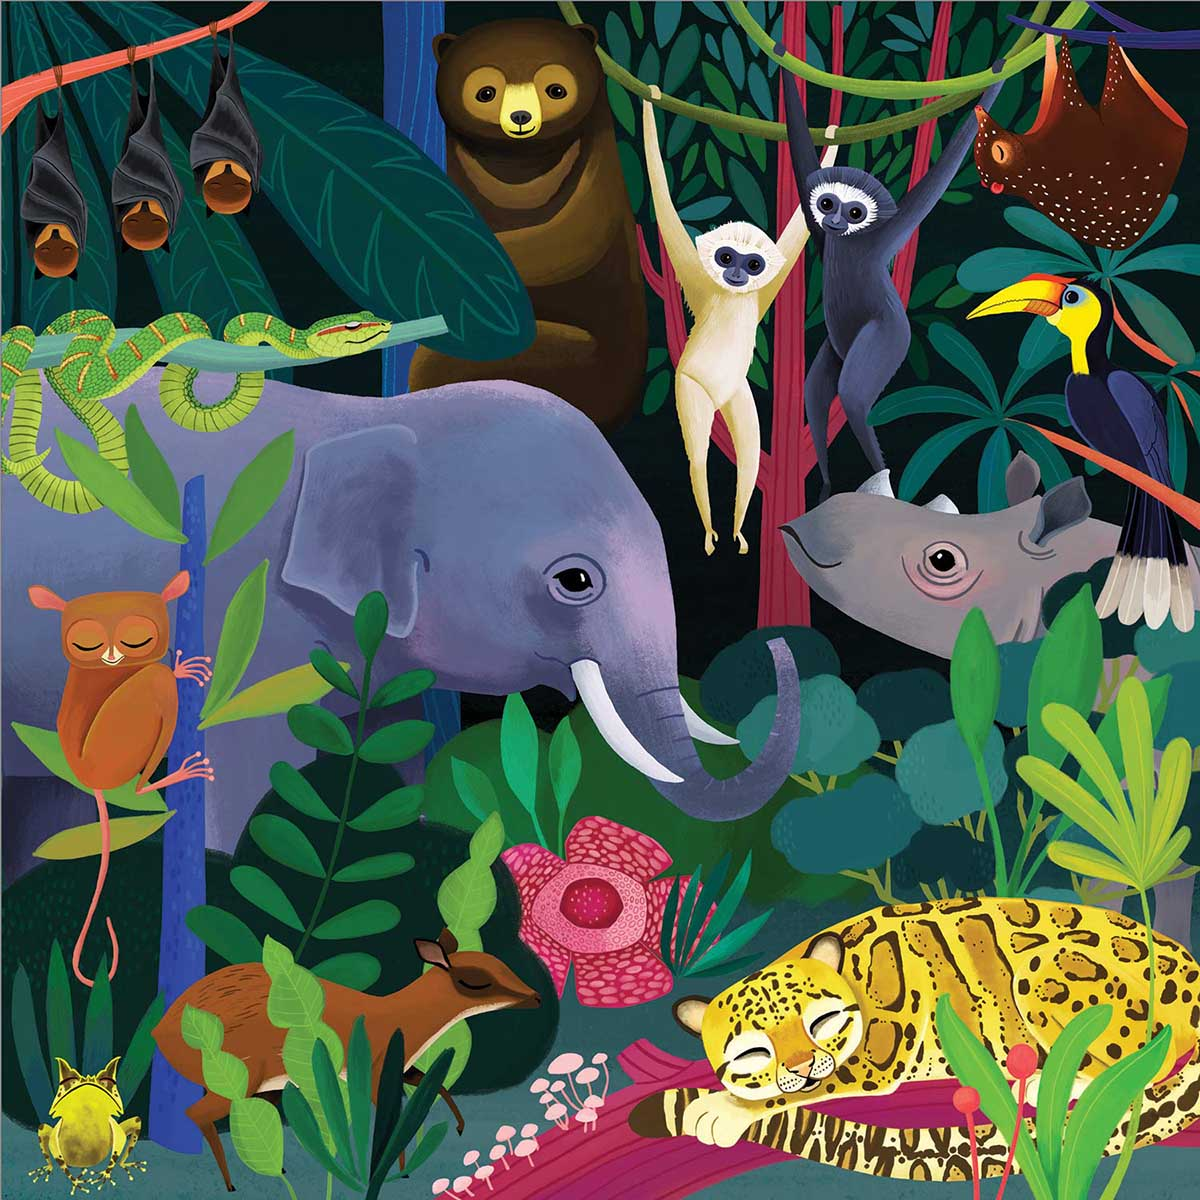 Jungle Illuminated Animals Glow in the Dark Puzzle